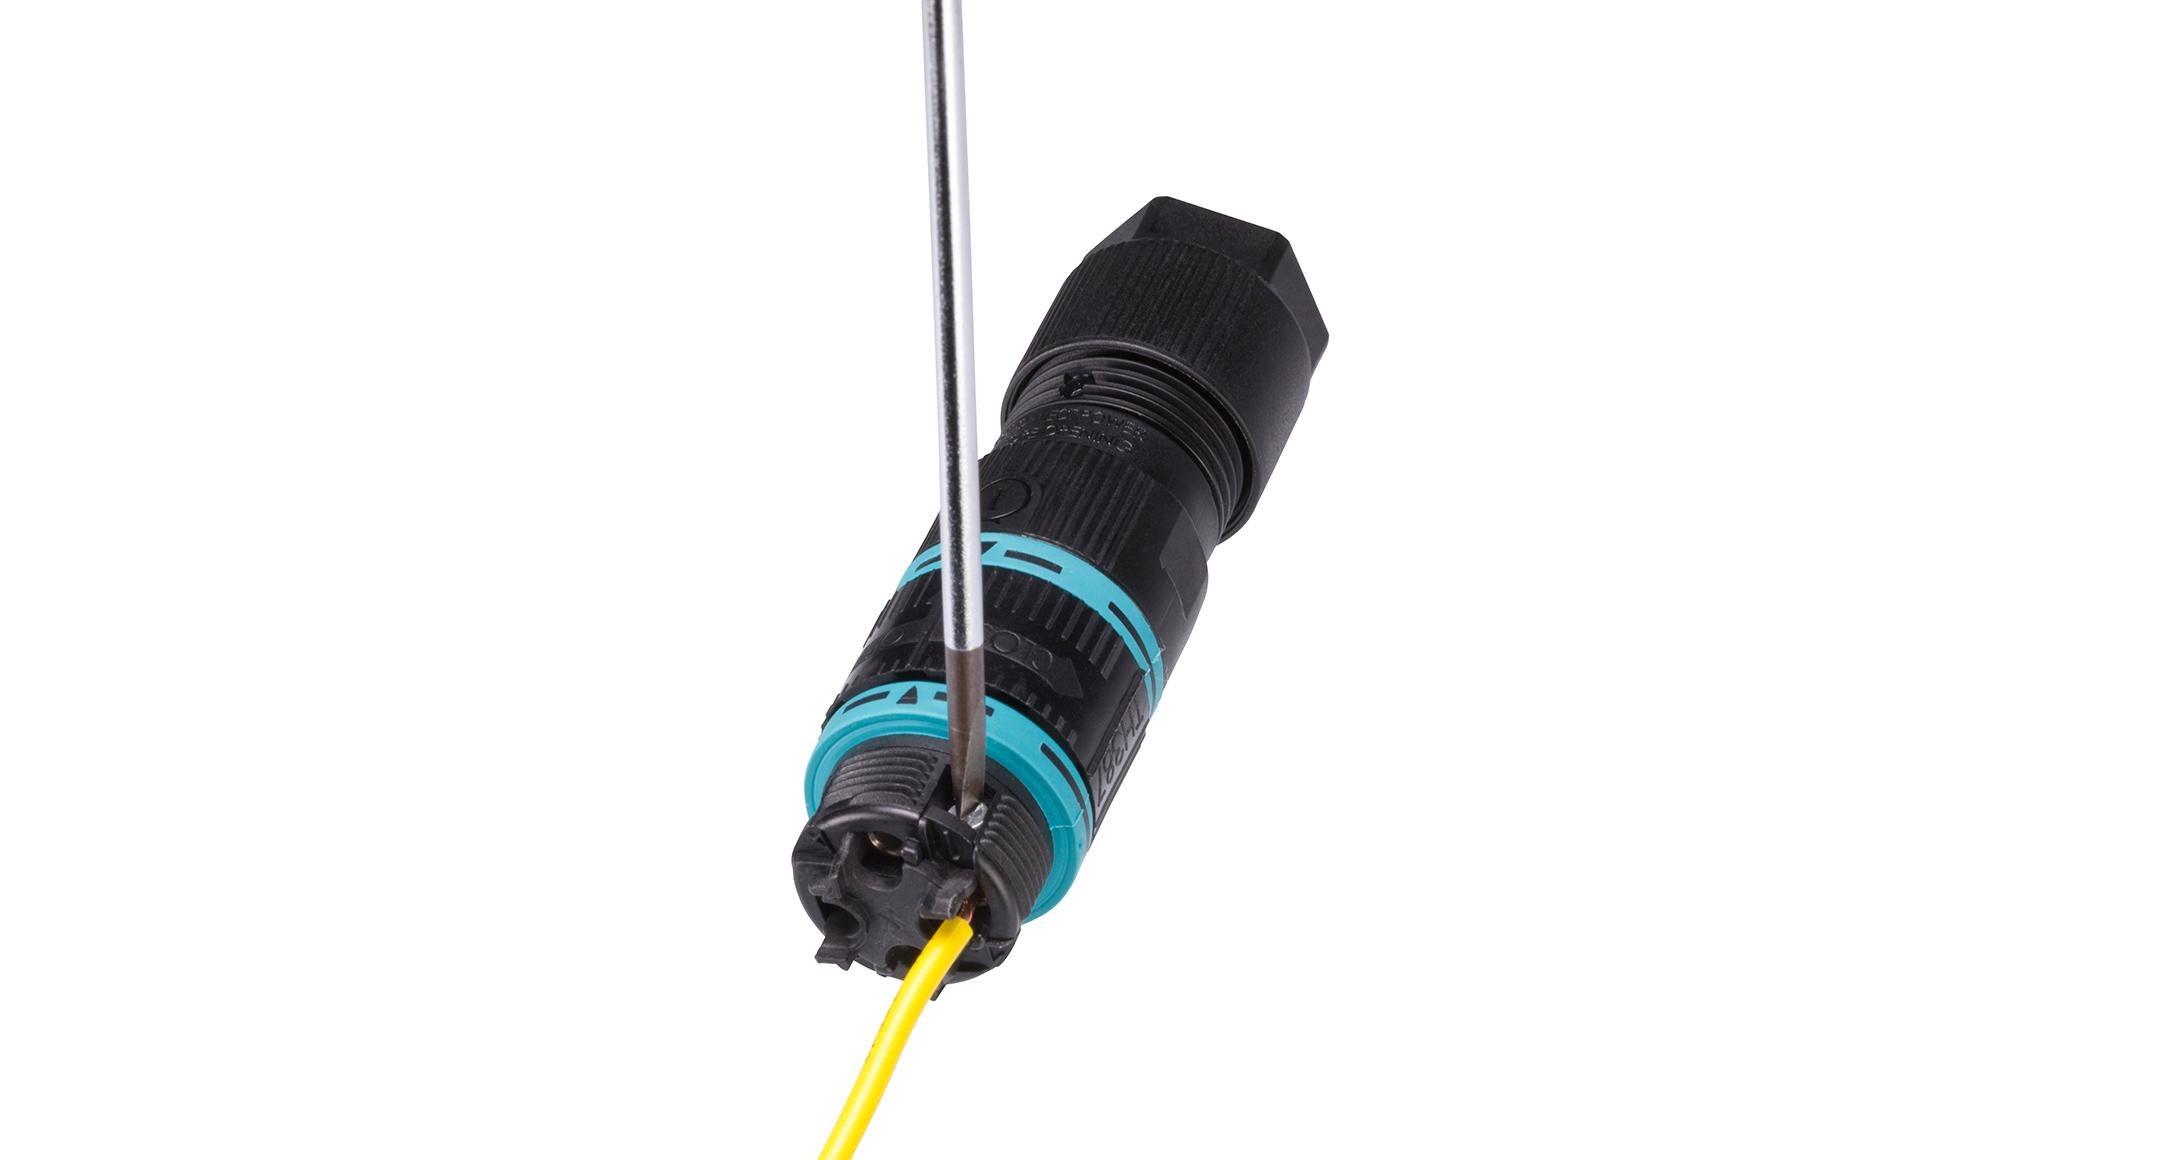 UL認証 防水中継コネクタ THB387Lシリーズの画像